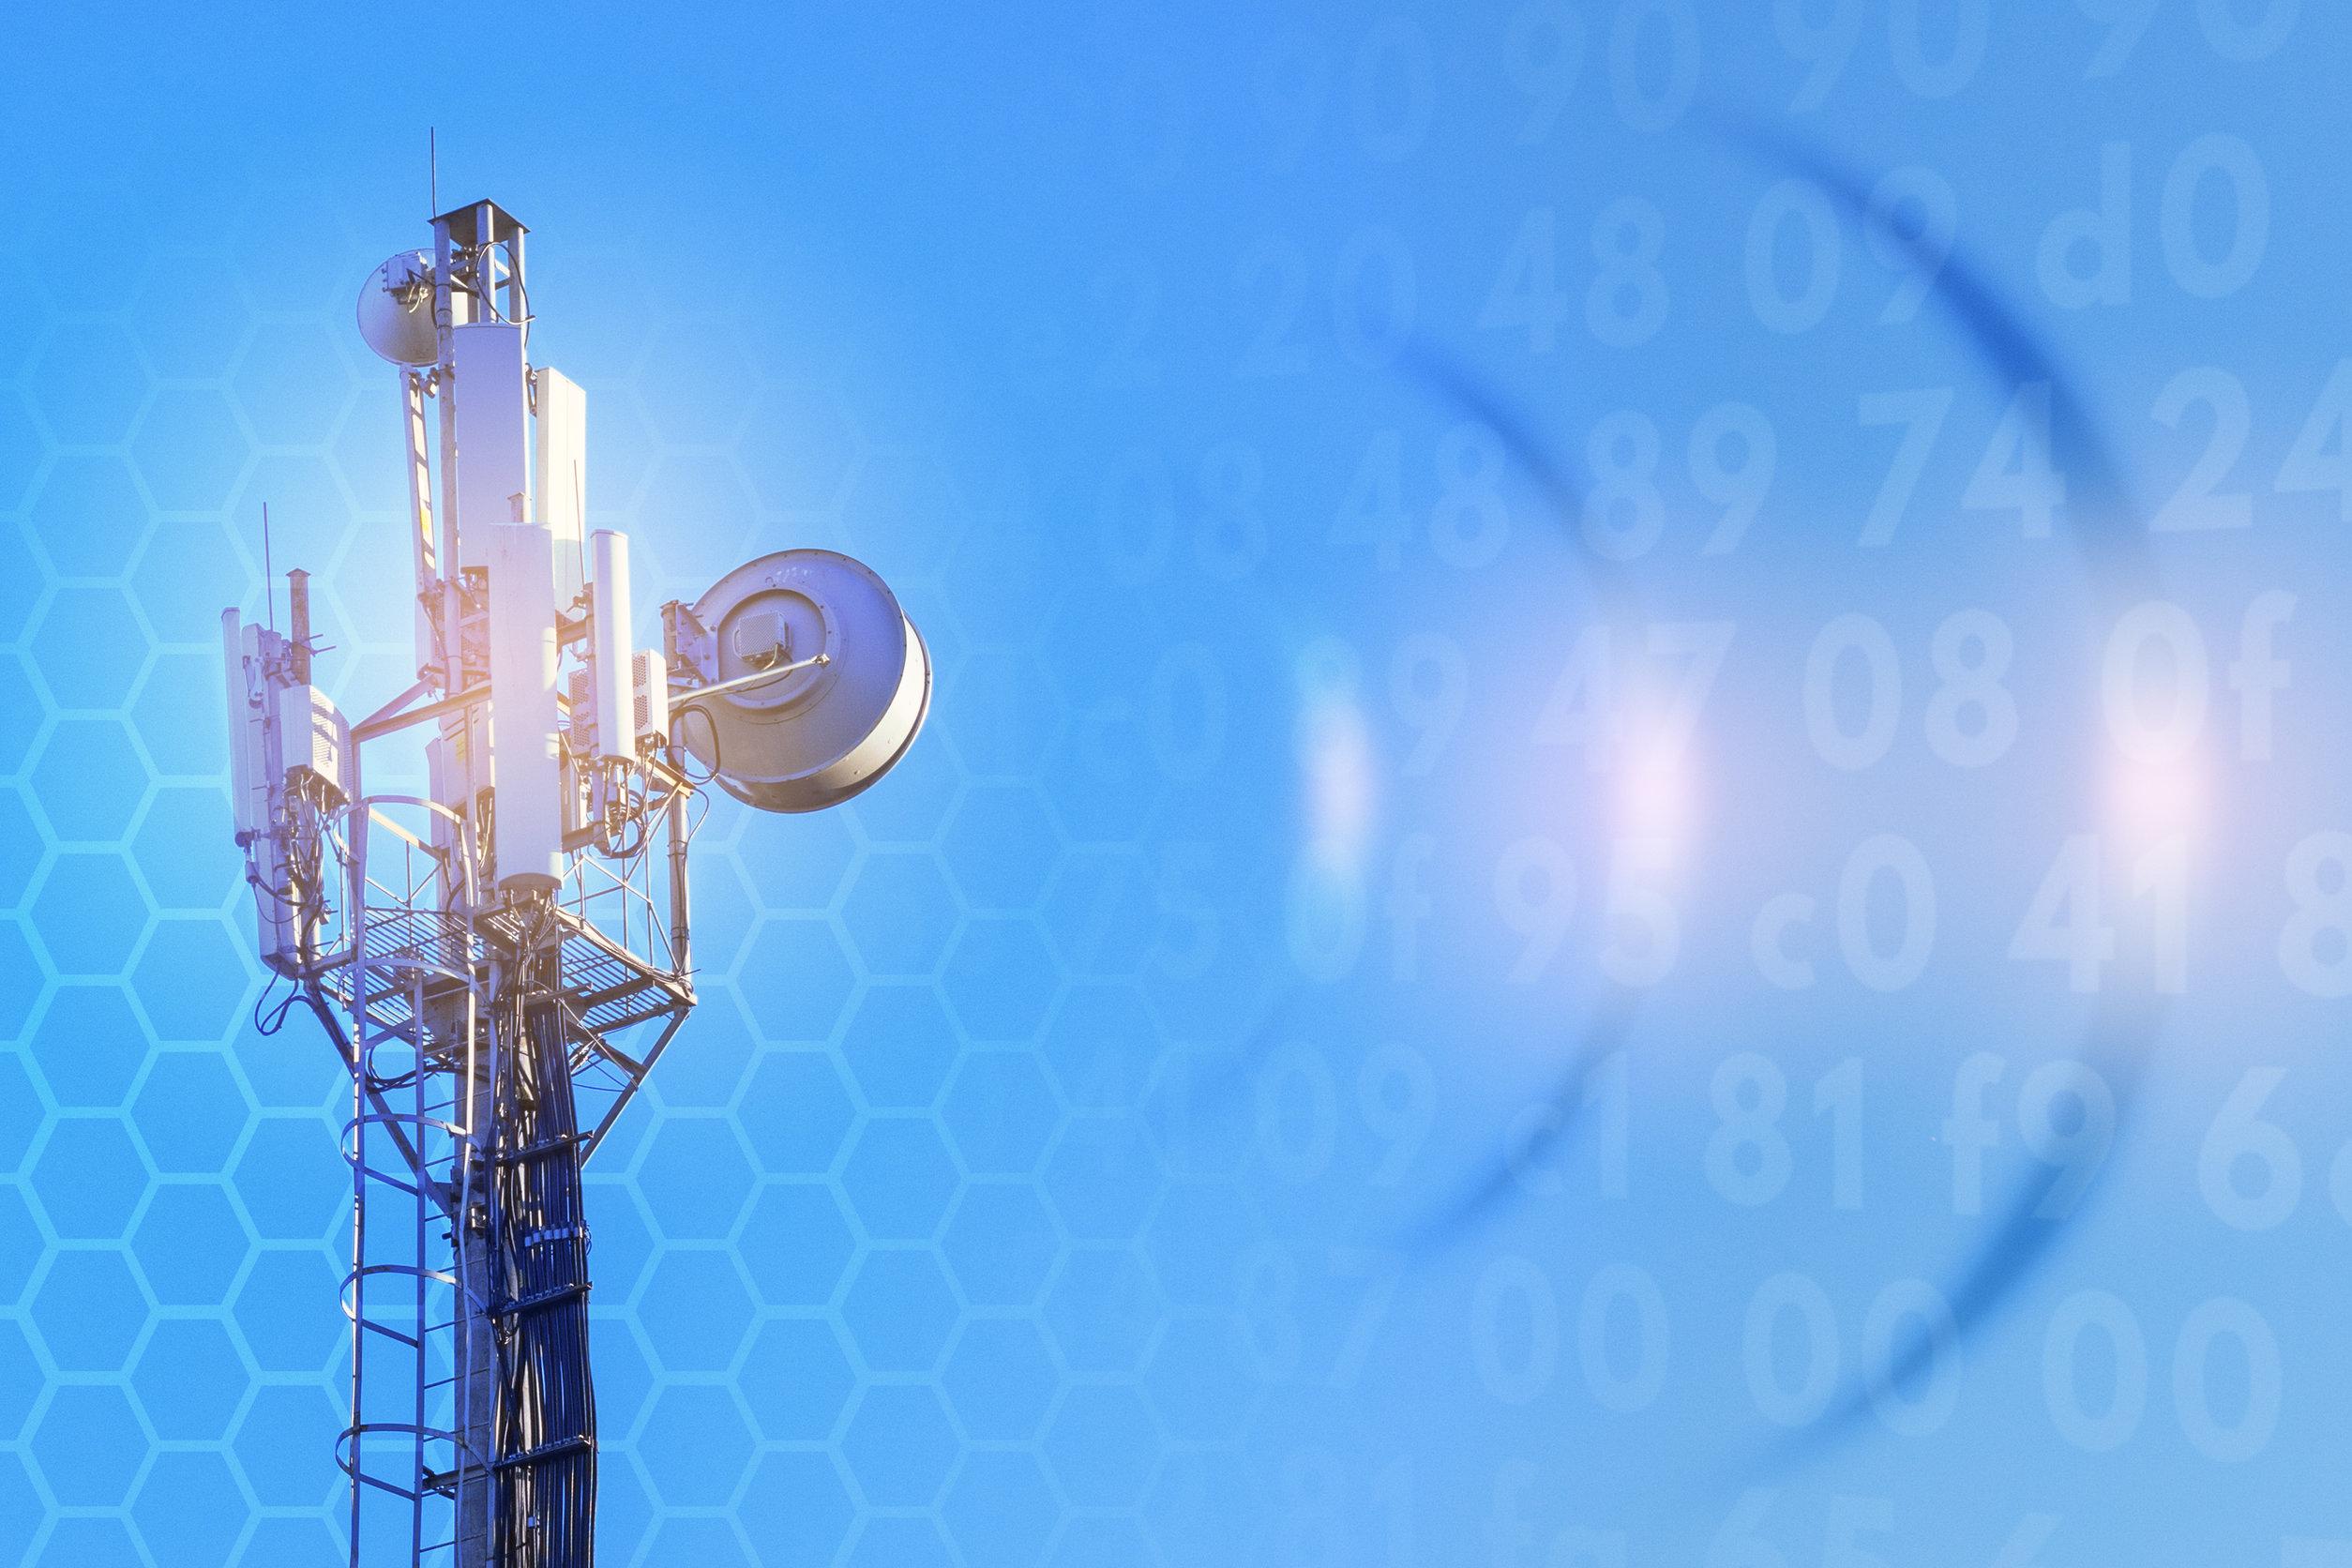 Concept Of Wireless Radio Internet. 5g. 4g, 3g Mobile Technologies.